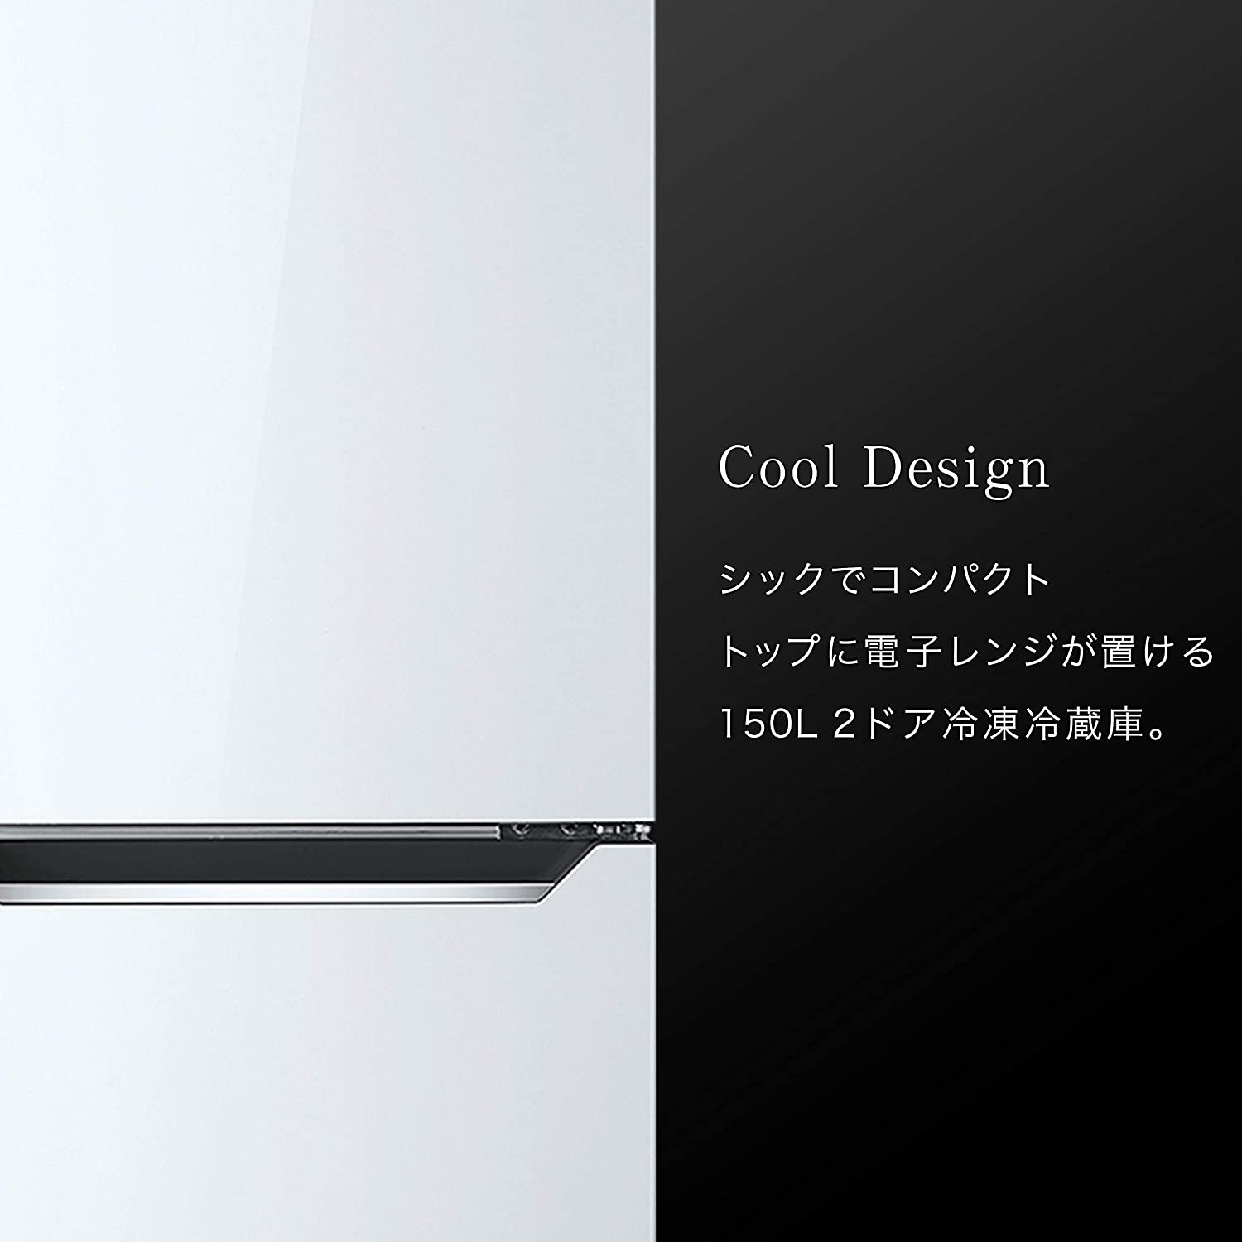 Hisense(ハイセンス)150L 冷凍冷蔵庫 HR-D15Cの商品画像3